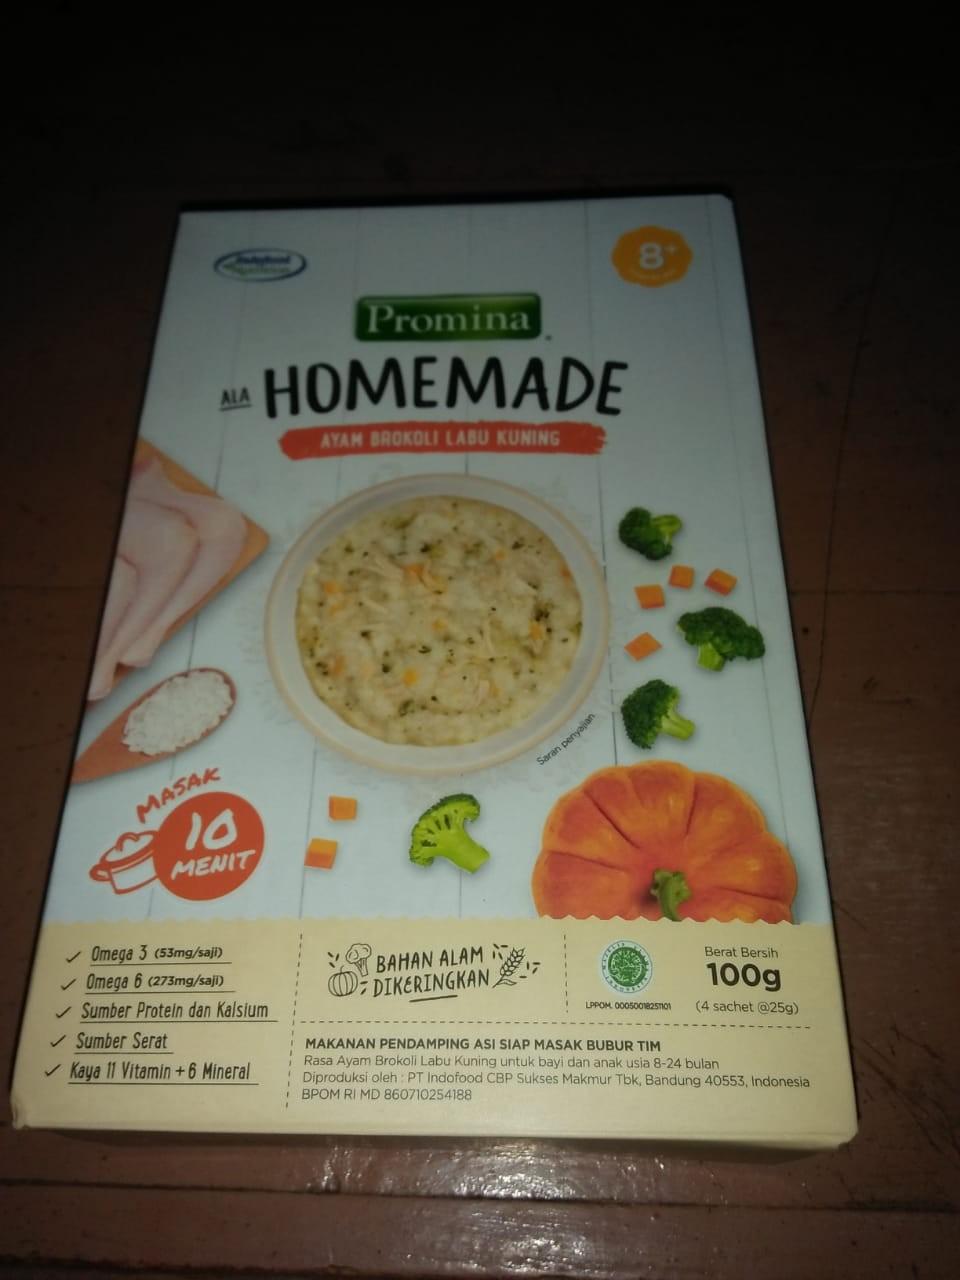 Promina Homemade 8 Mpasi Bubur Salmon Kentang Wortel Ayam Brokoli Labu Kuning Box 100gr Shopee Indonesia